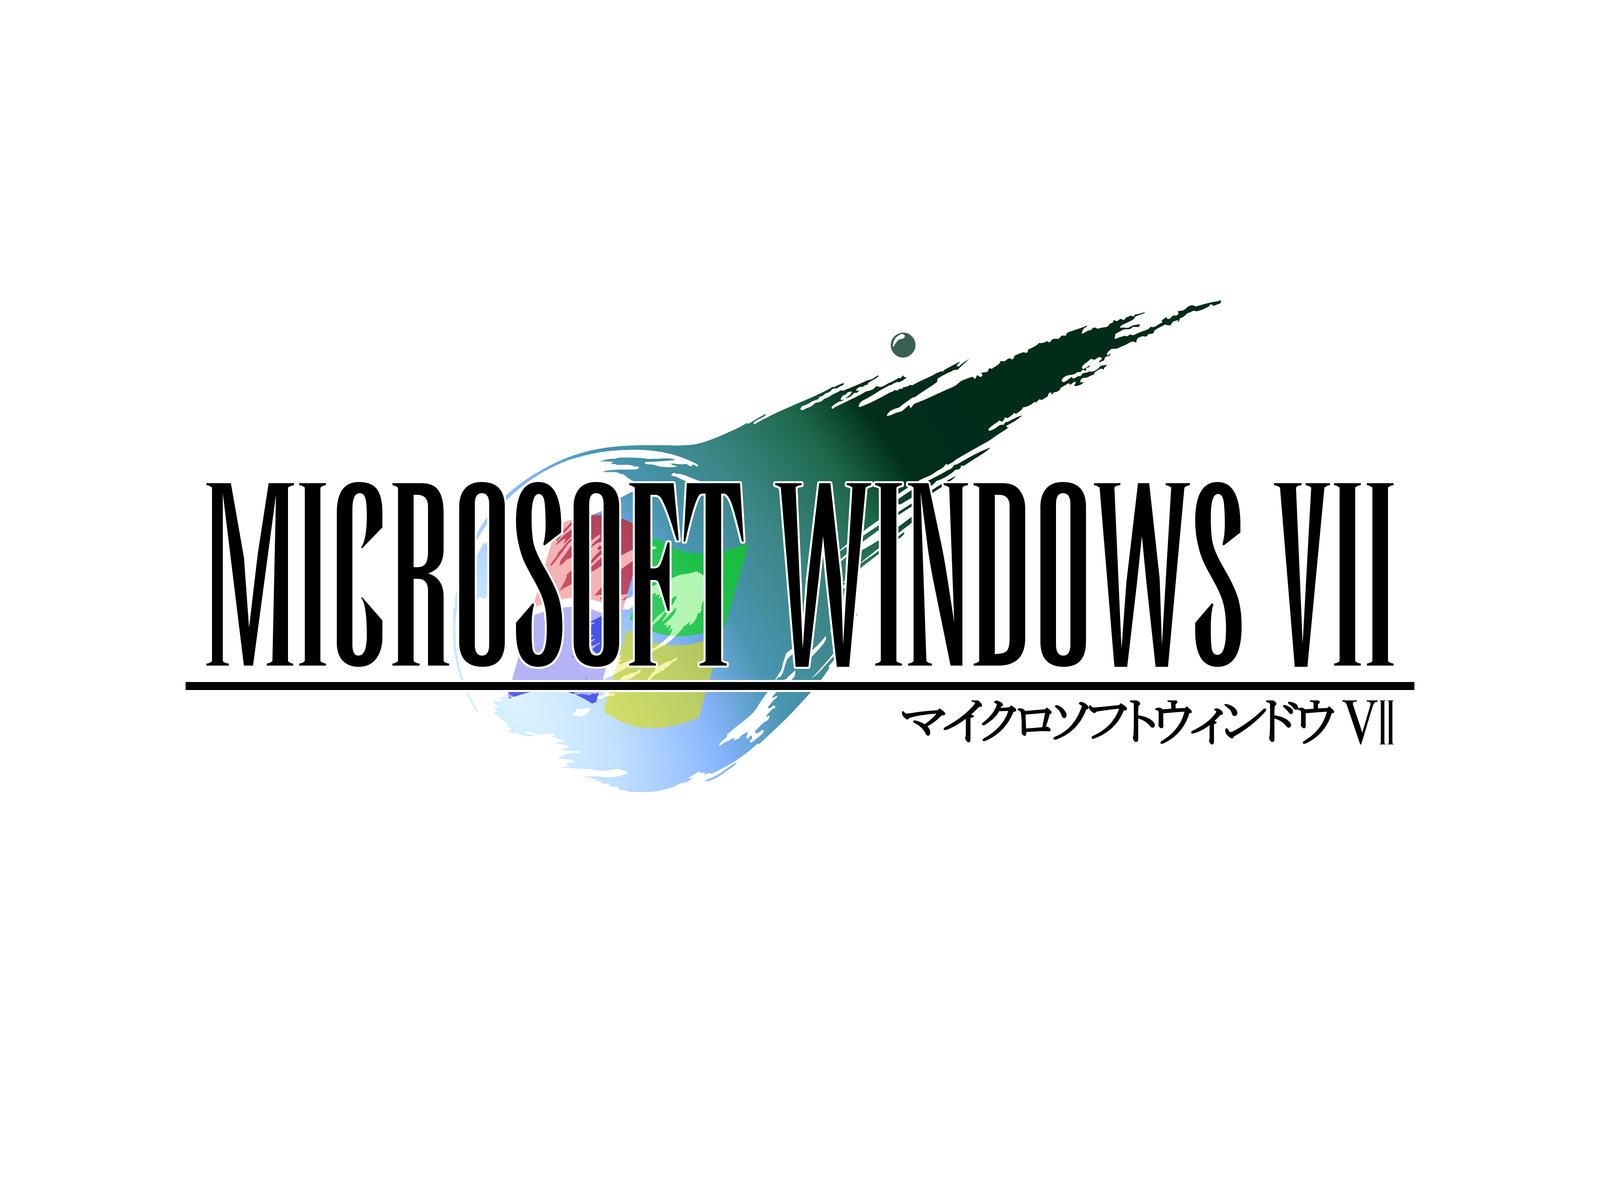 final fantasy vii style windows 7 logo by critman on